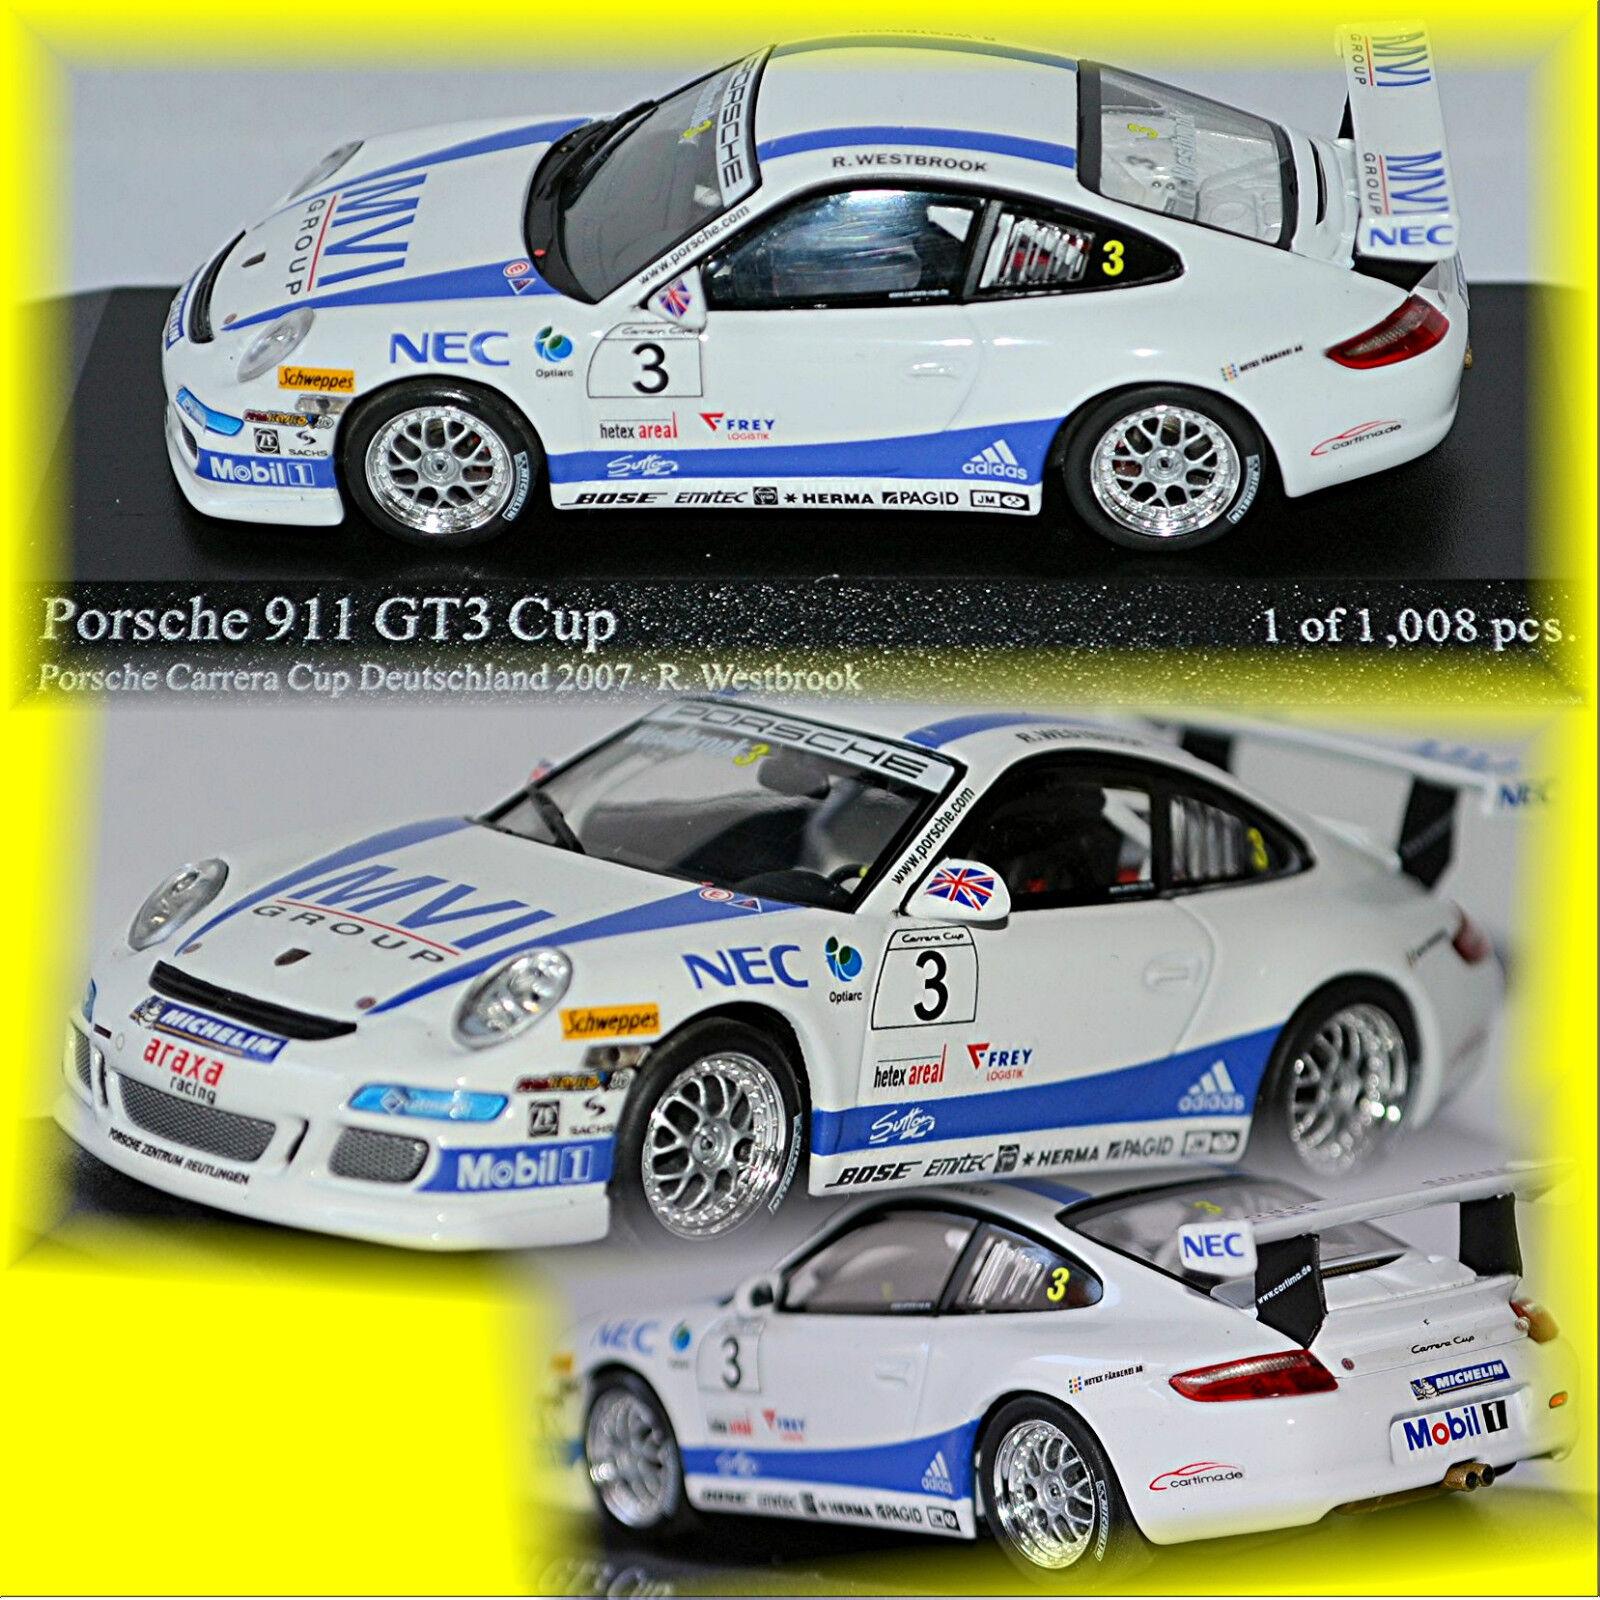 Porsche 911 997 gt3 Carrera Cup 2007  3 Westbrook 1 43 Minichamps